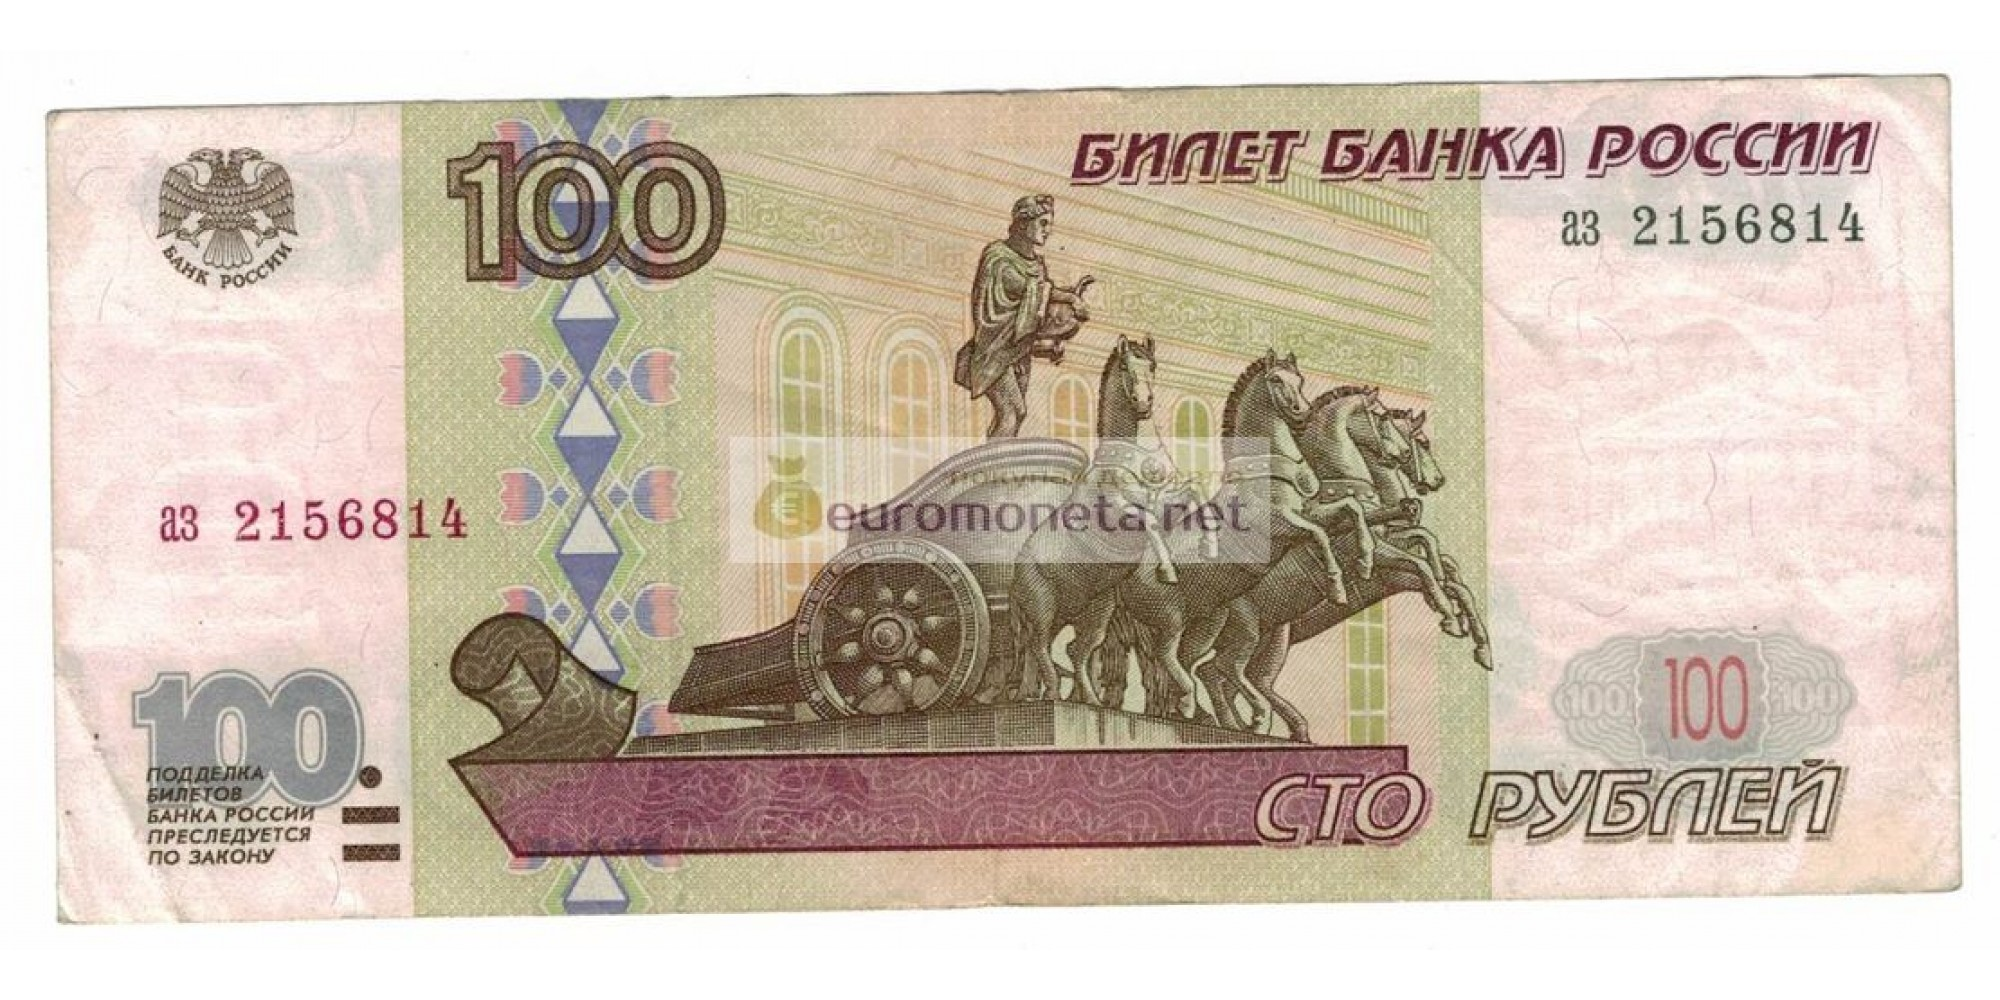 Россия 100 рублей 1997 год без модификации серия аз 2156814